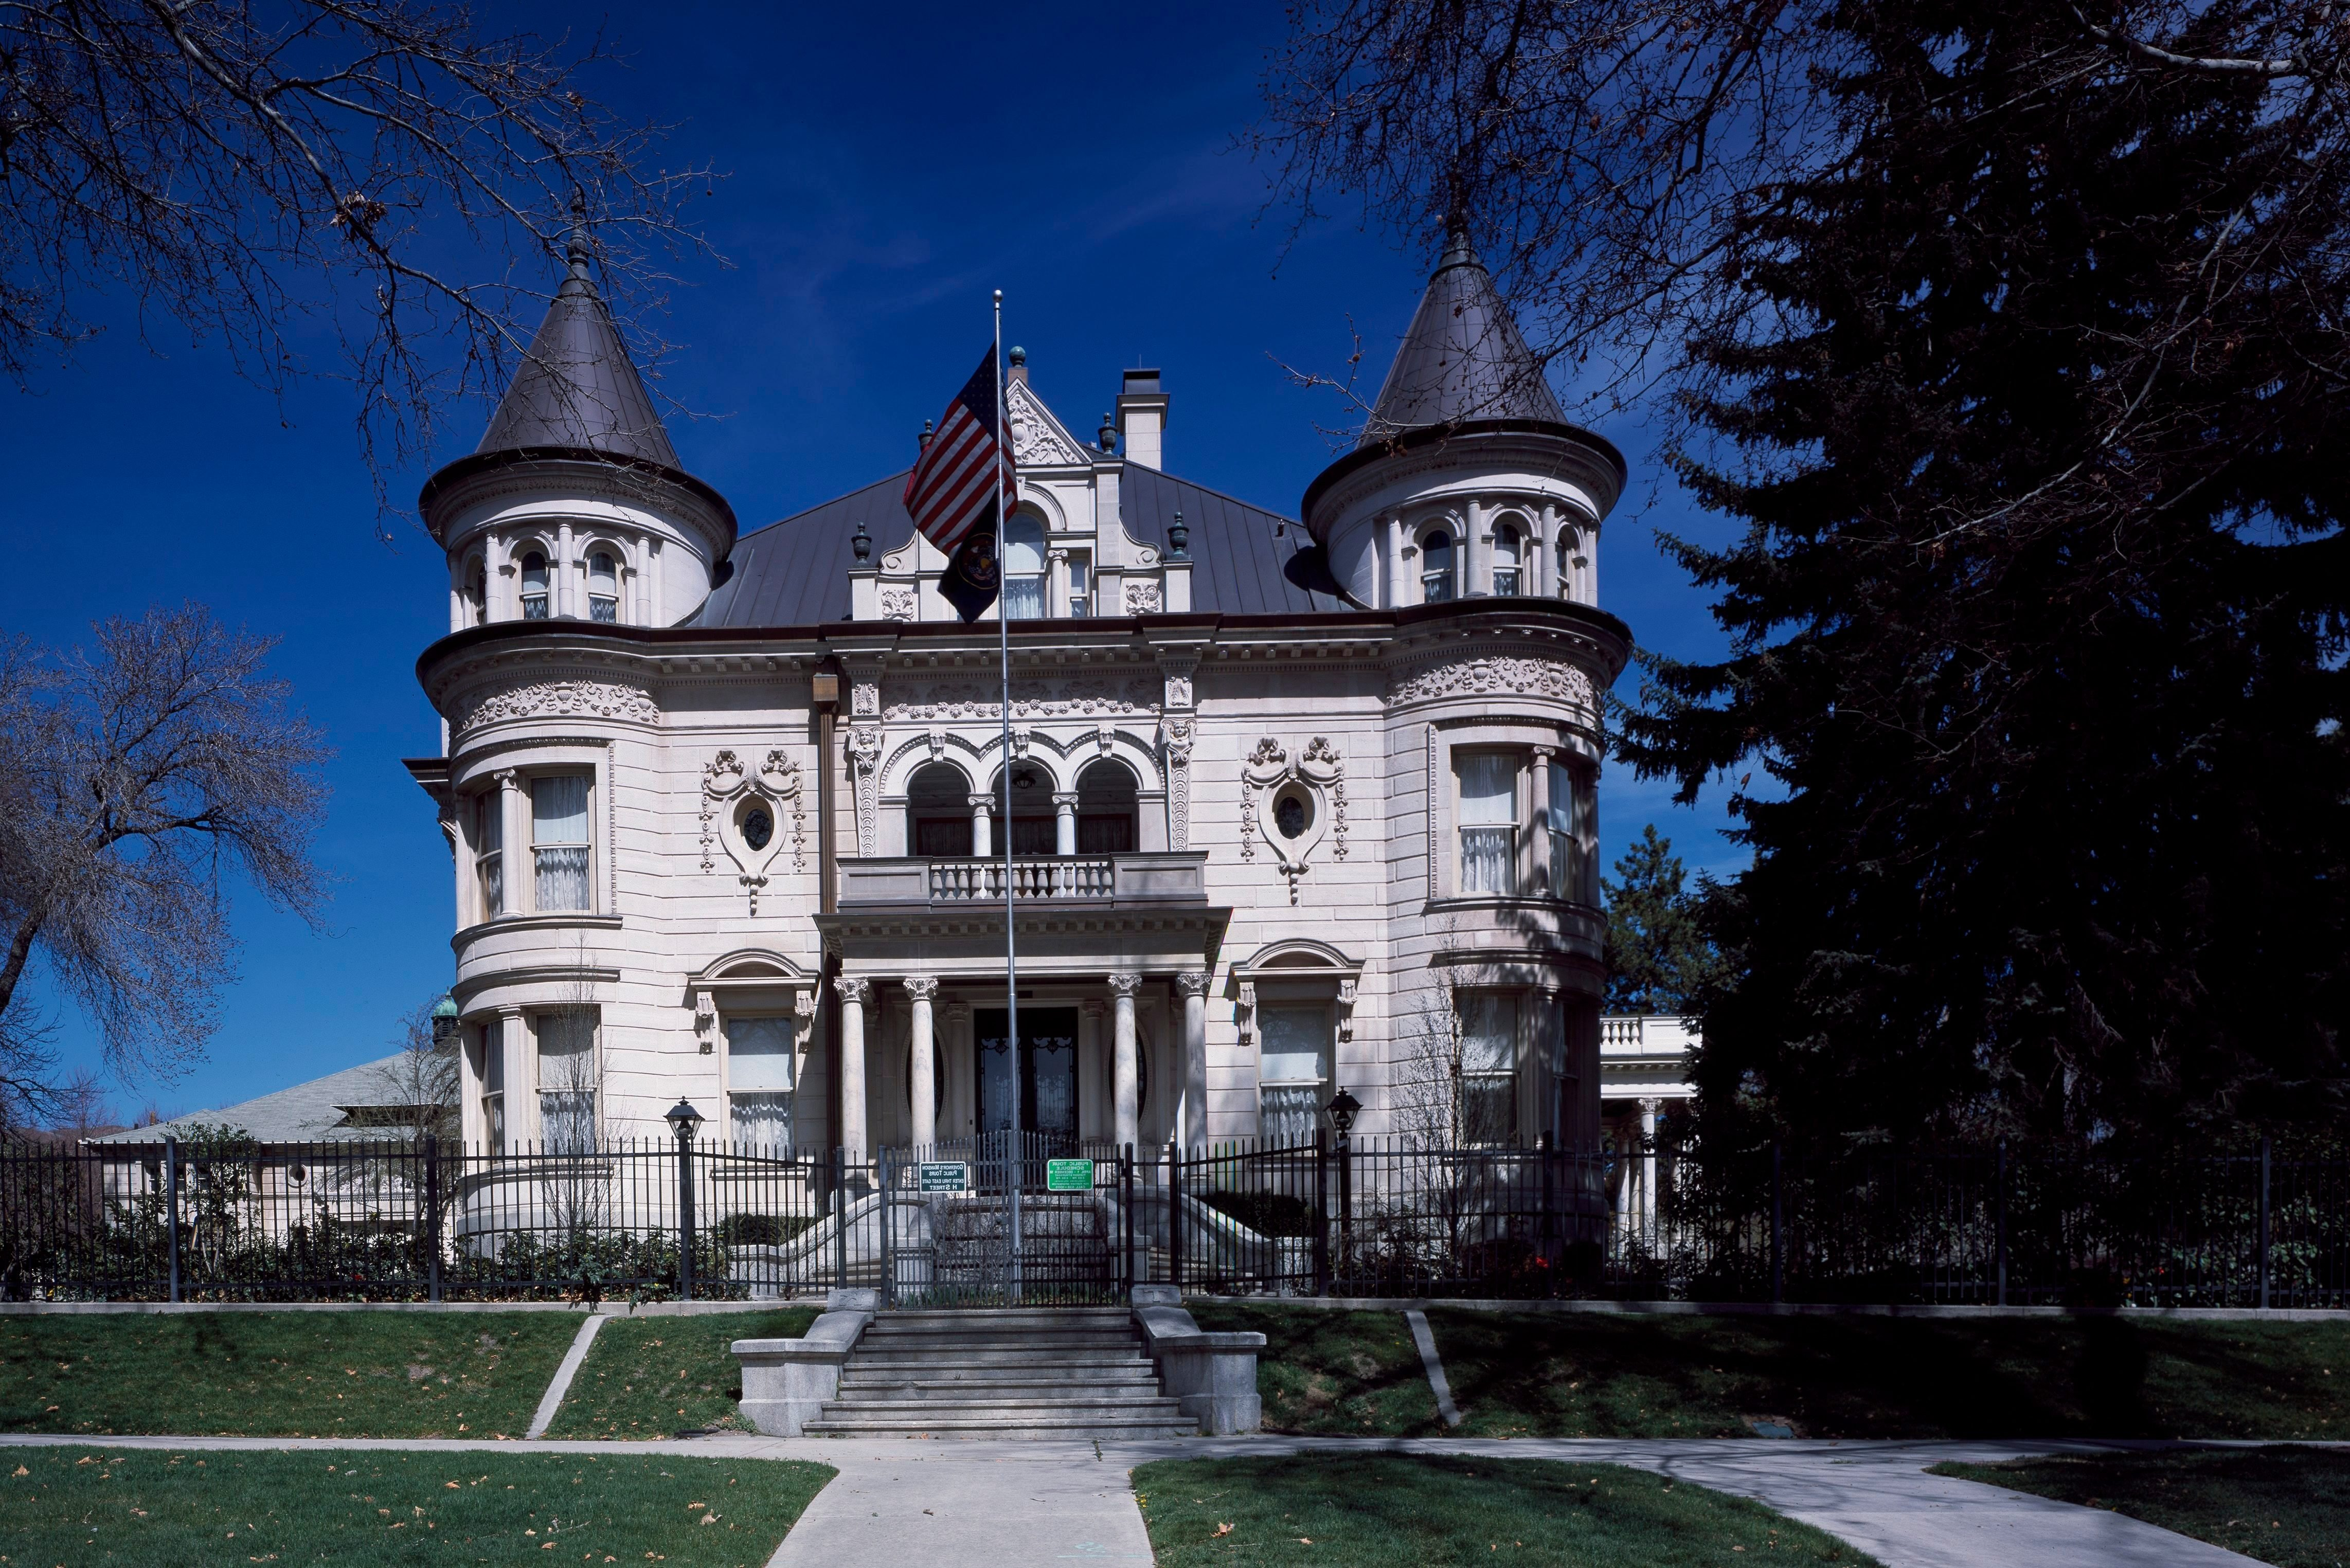 Governor Mansion, Salt Lake City, Utah